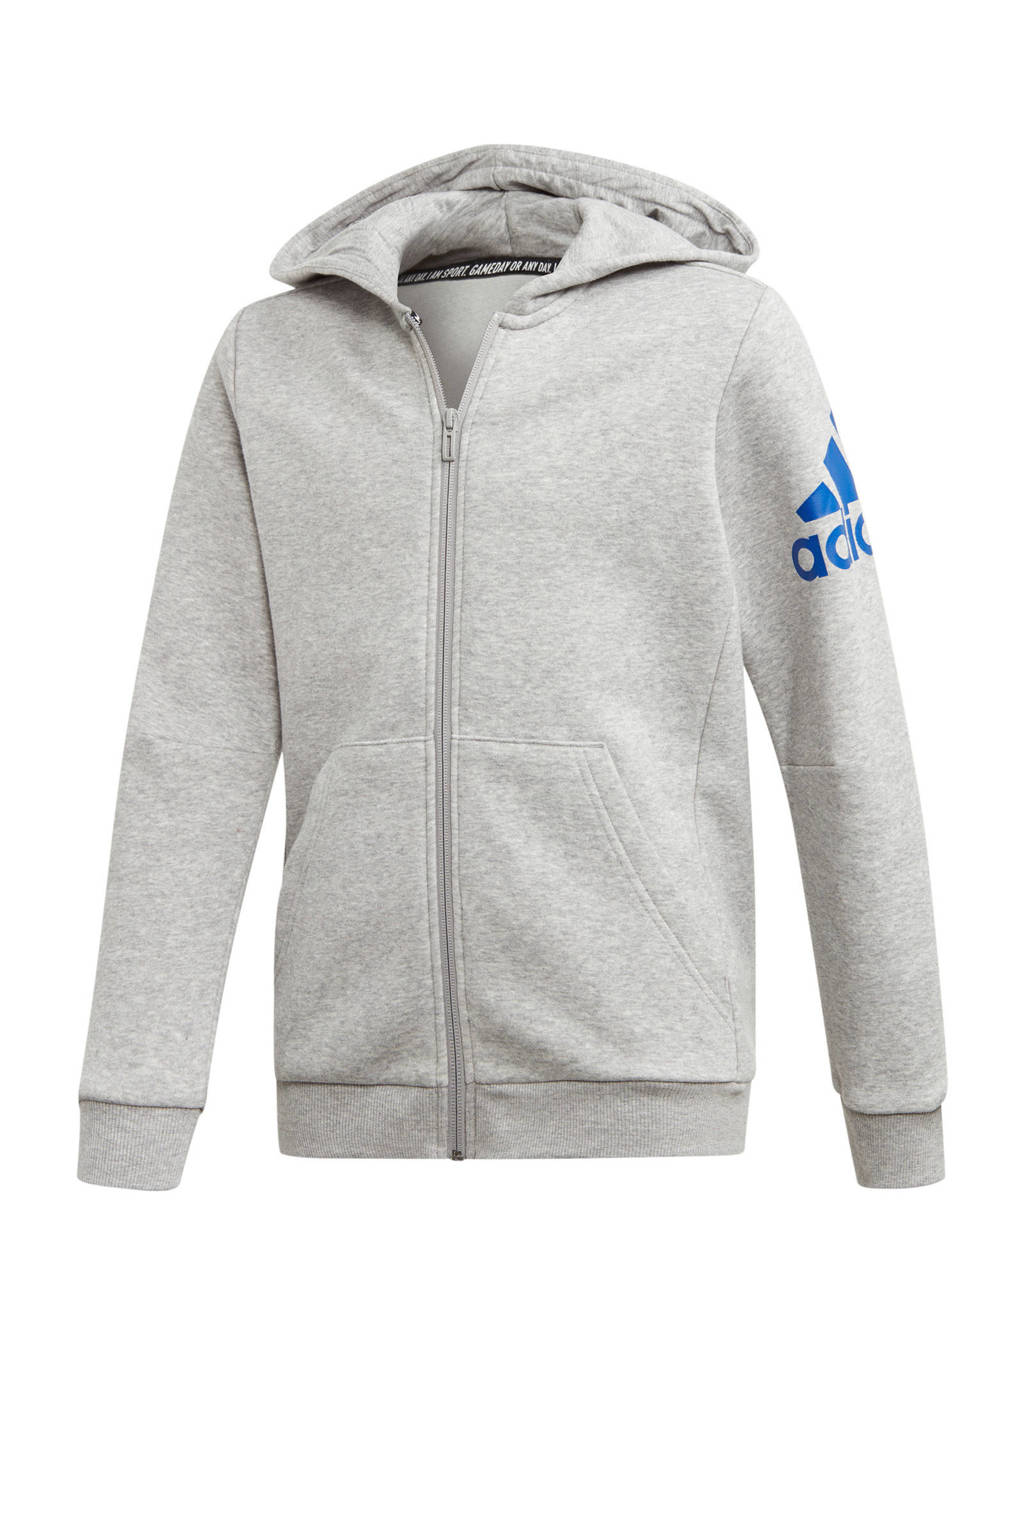 adidas performance   sportvest grijs melange, Grijs melange/blauw